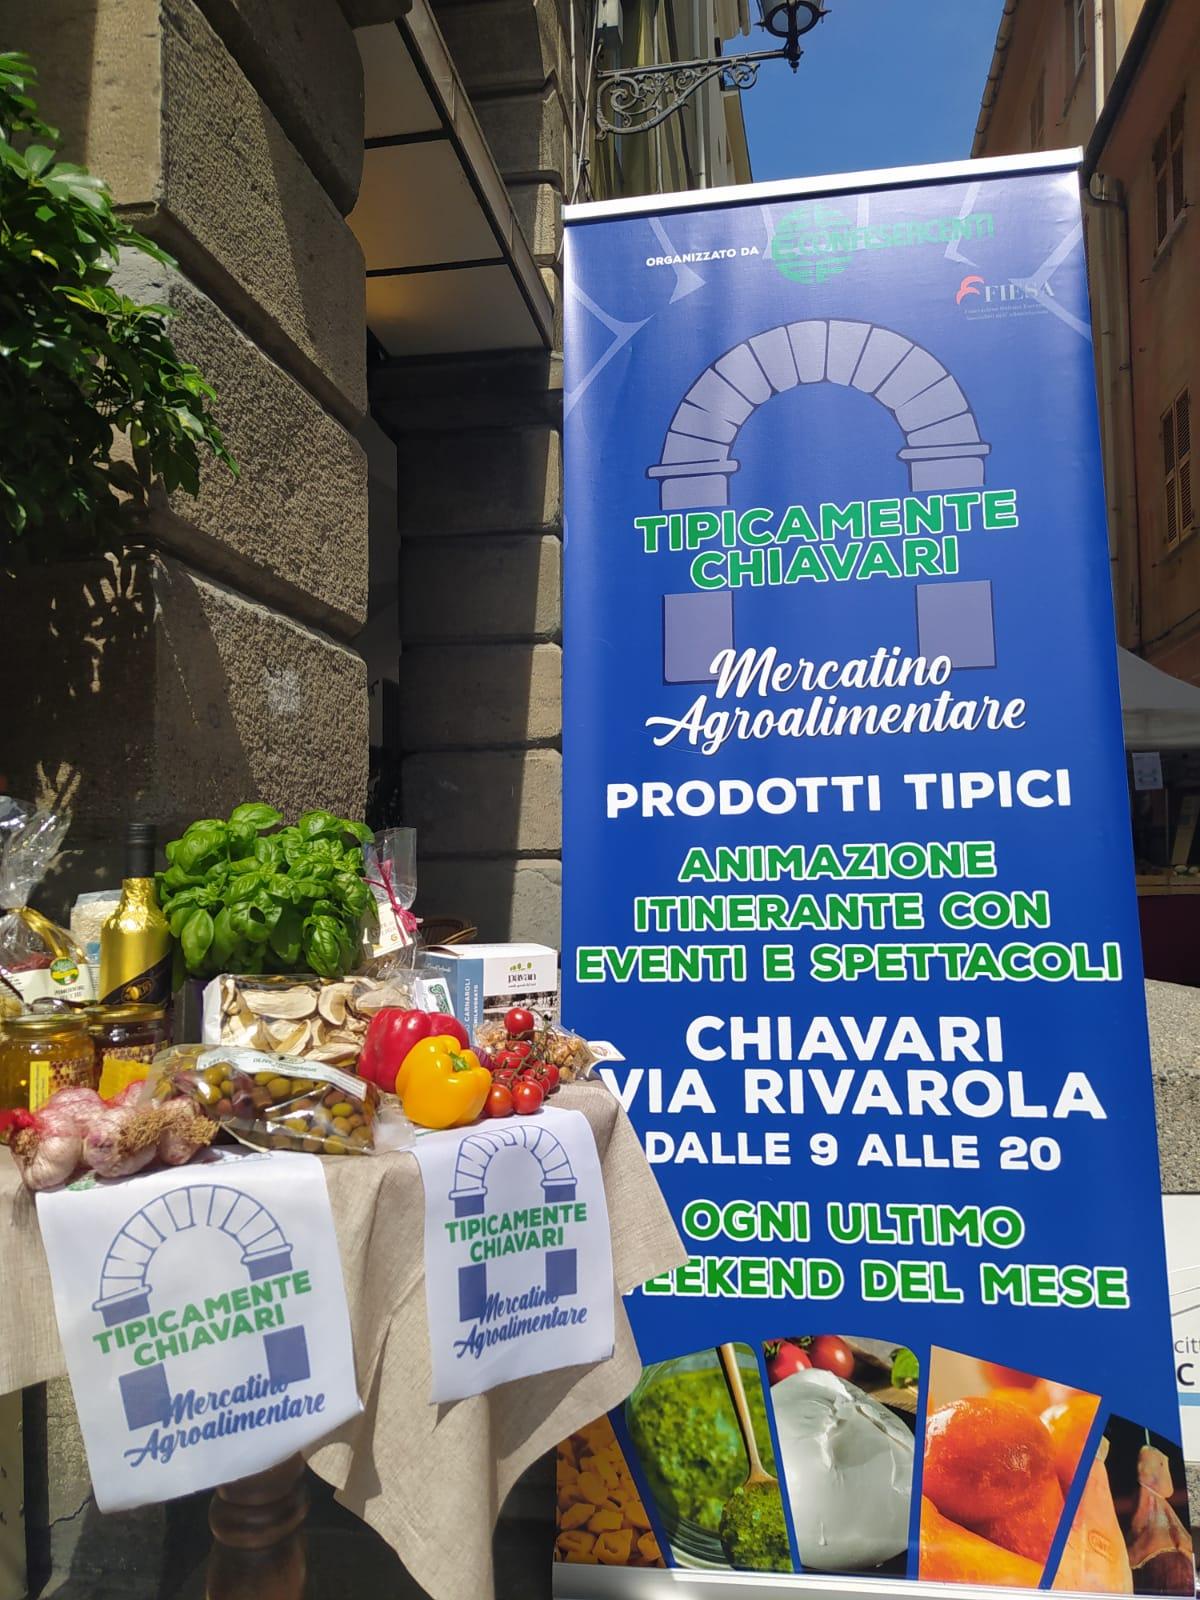 Confesercenti Liguria, Chiavari: nel weekend torna il Mercatino Agroalimentare di via Rivarola